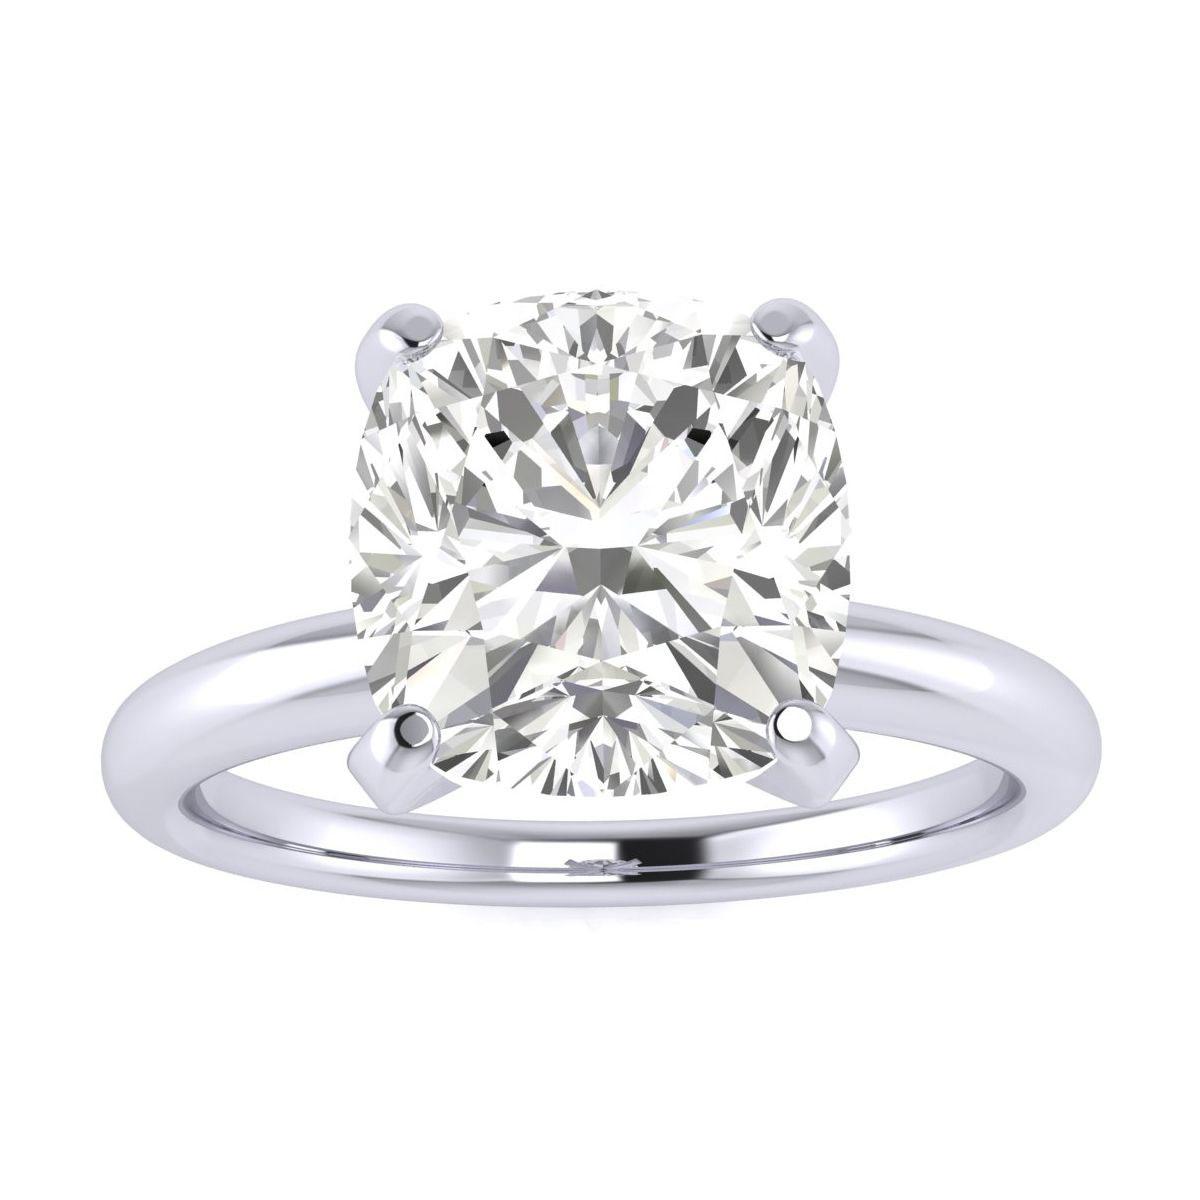 3 Carat Cushion Cut Diamond Engagement Ring in 14k White Gold (6.